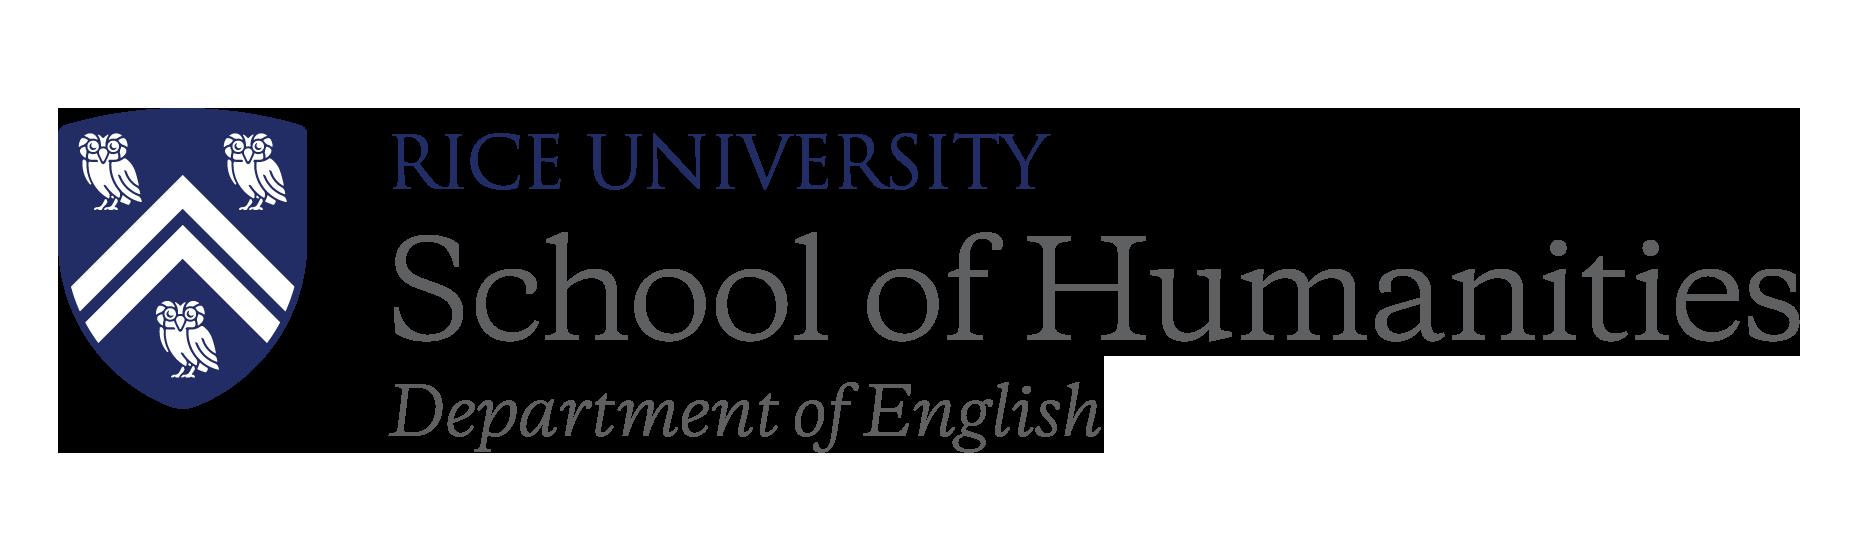 Rice University School of Humanities Department of English